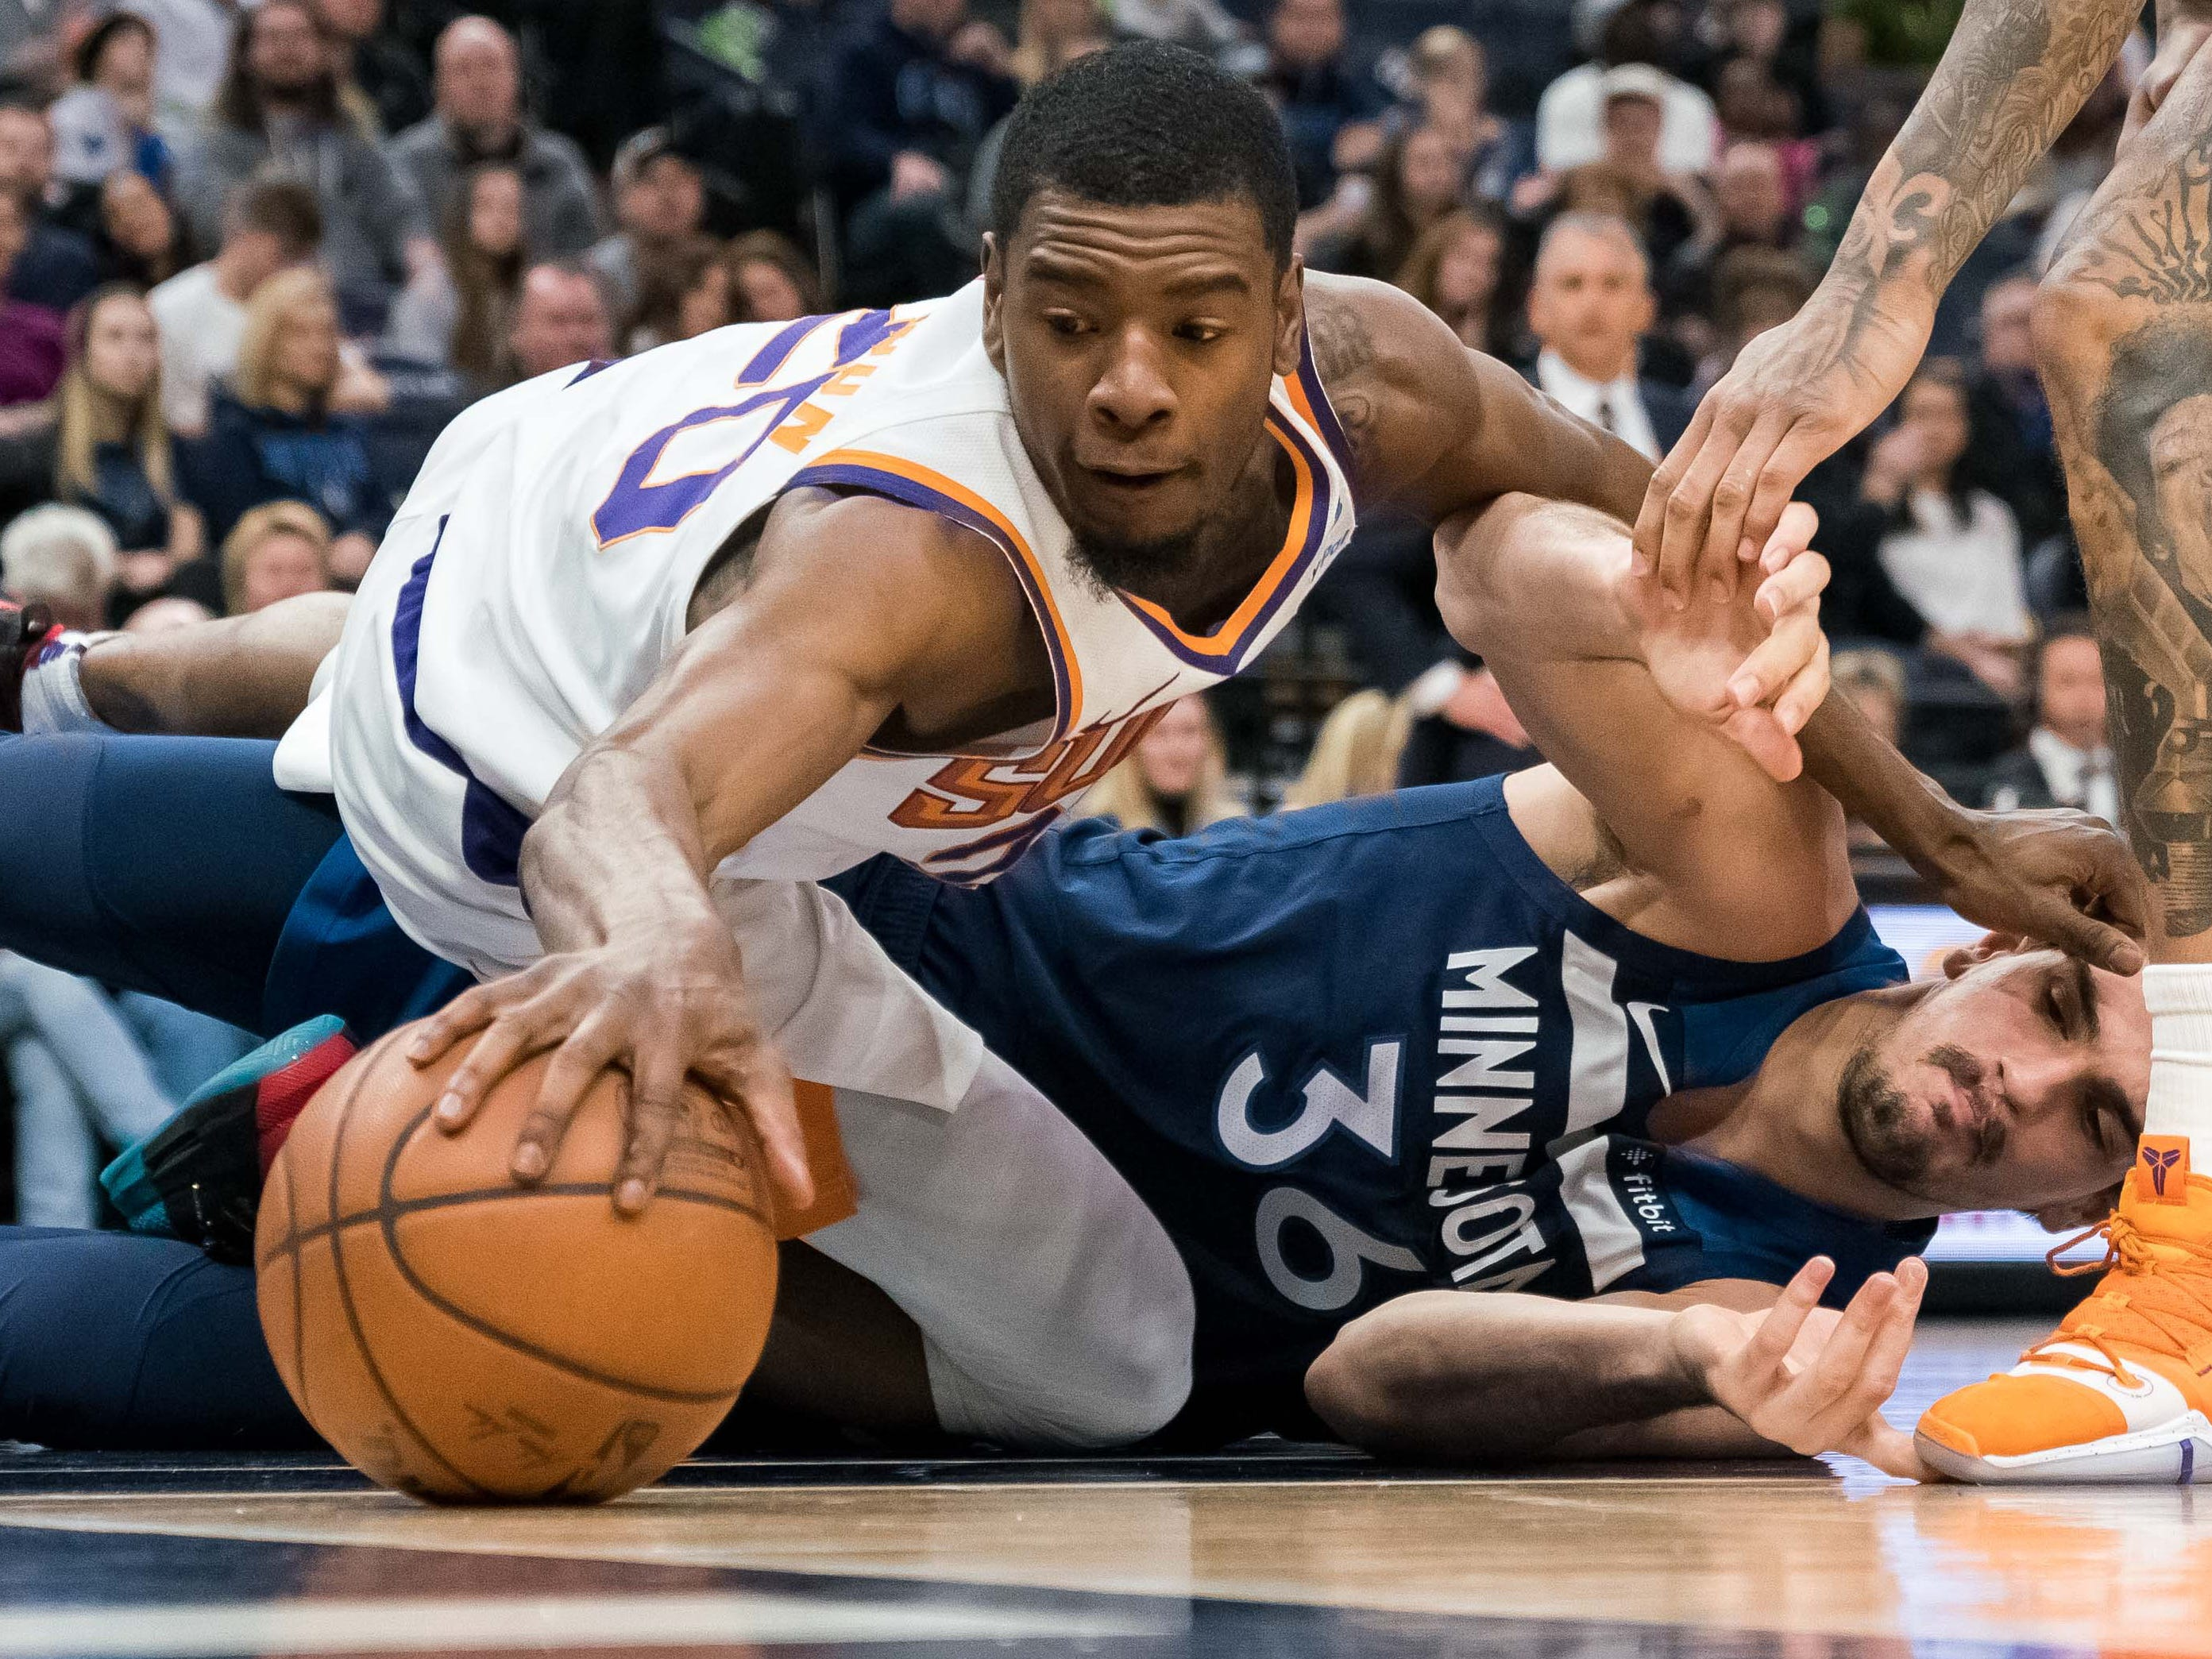 Jan. 20: Suns forward Josh Jackson (20) dives T'wolves forward Dario Saric (36) during a second-half scramble for a loose ball in Minneapolis.